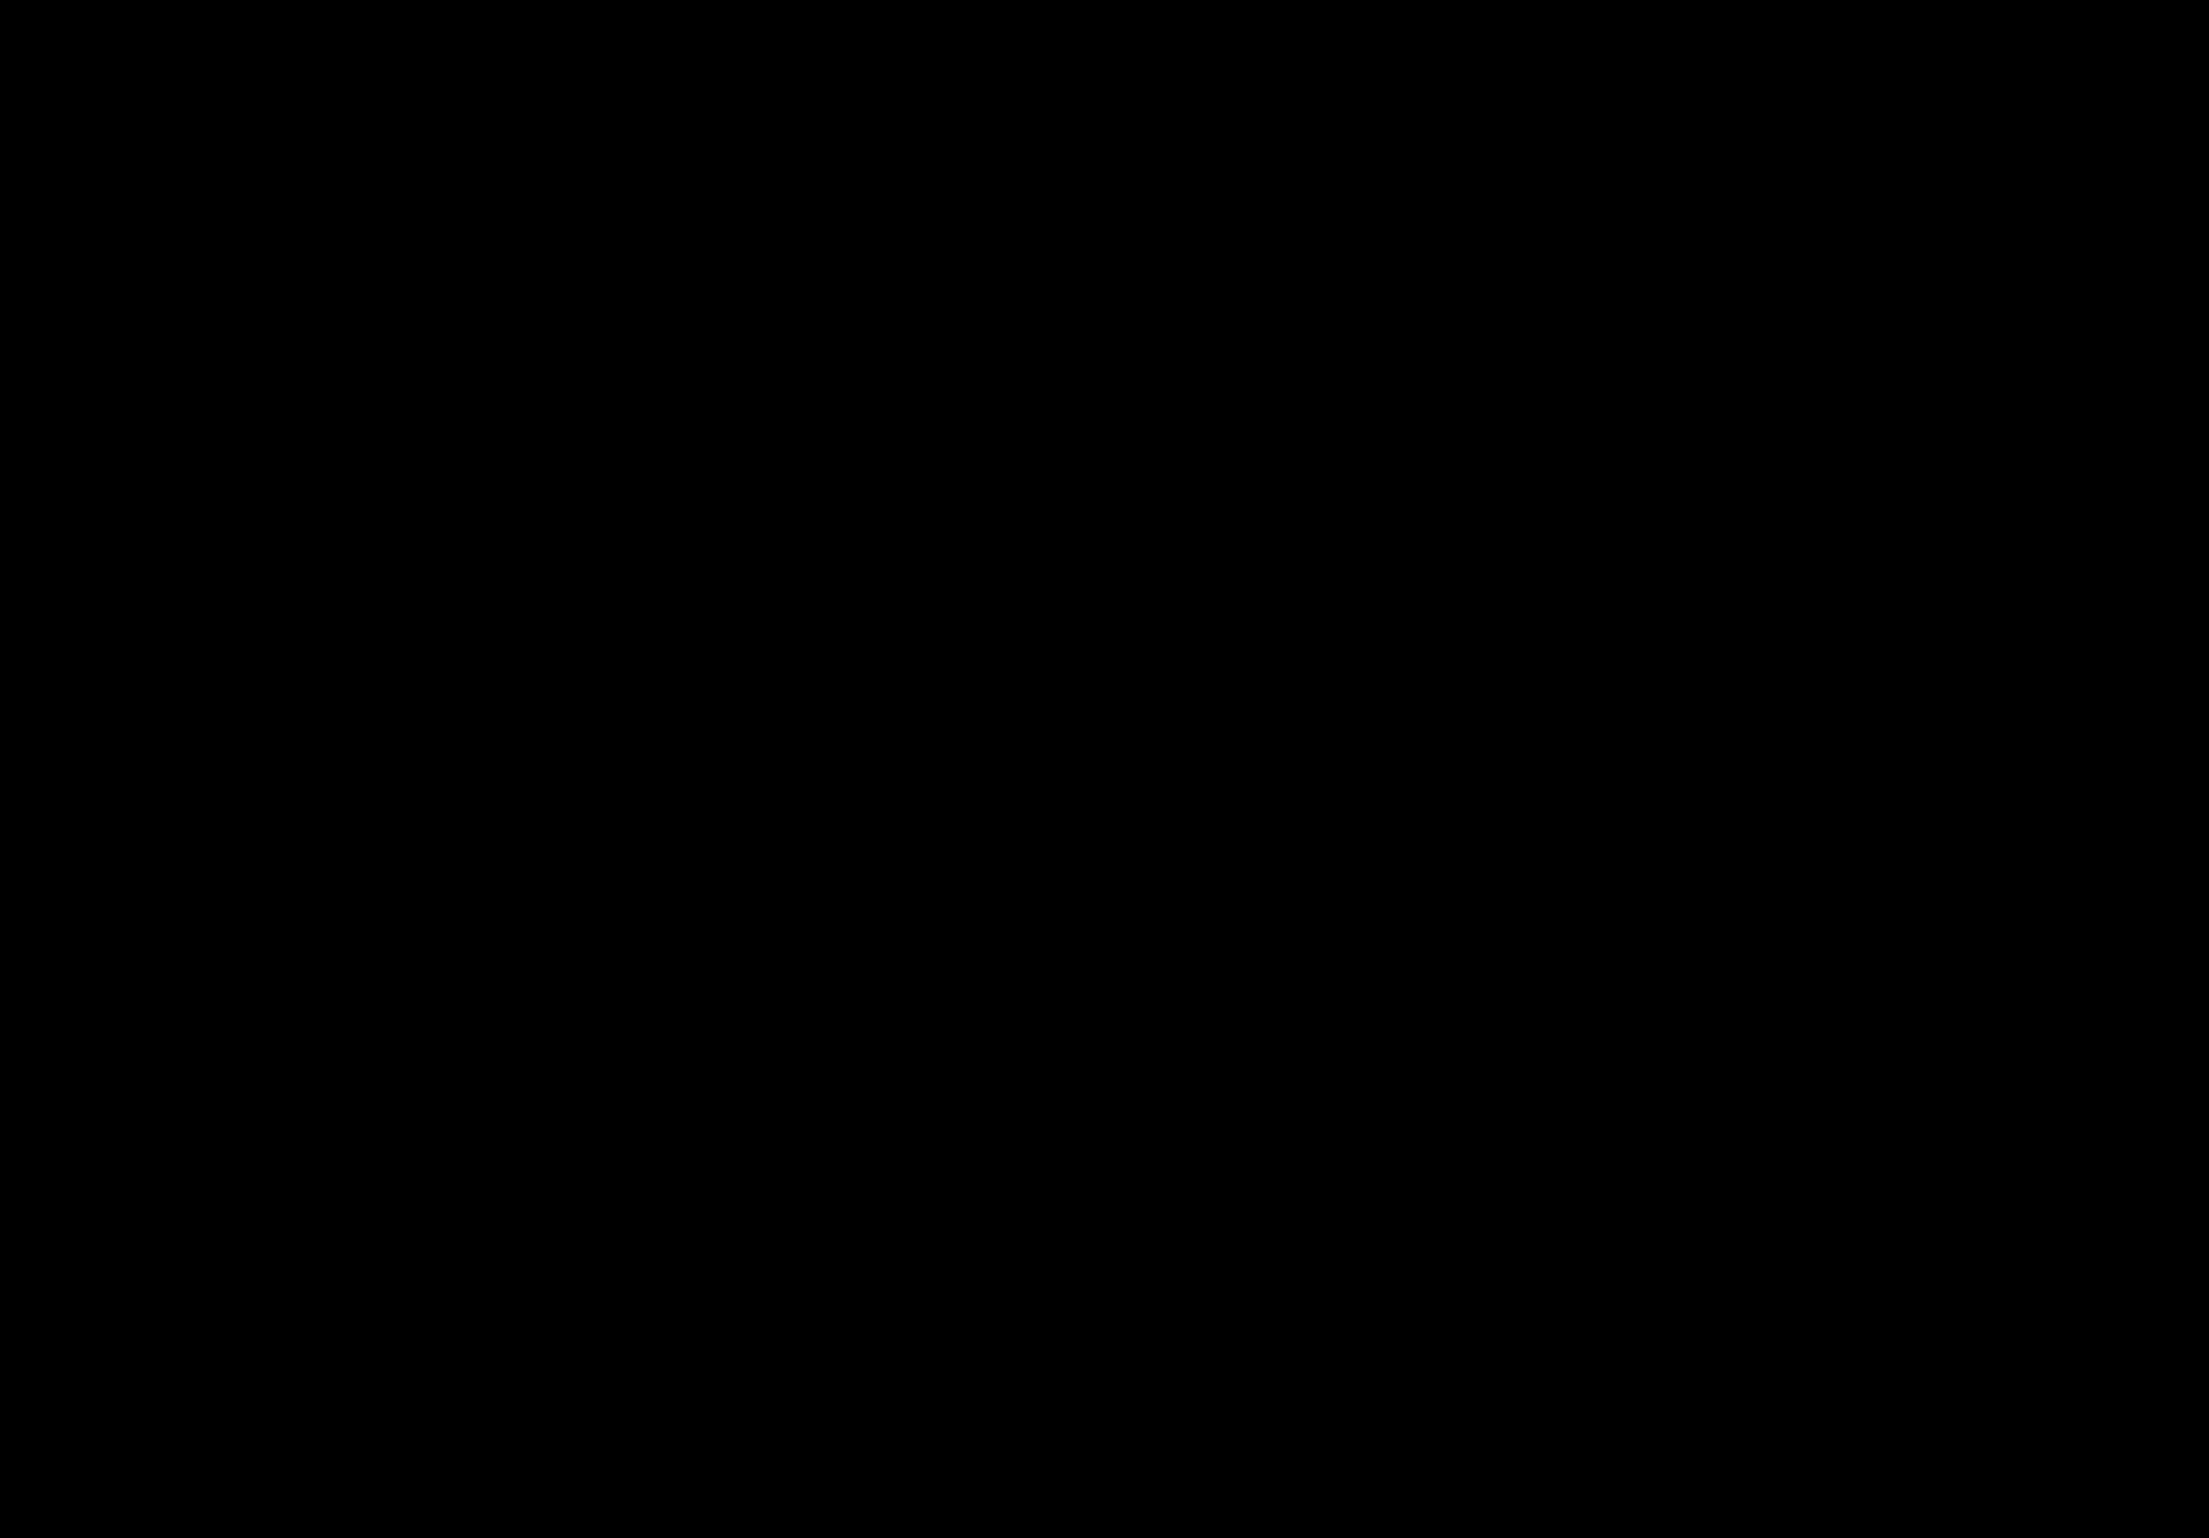 2209x1538 Twitter Logo Png Royalty Free